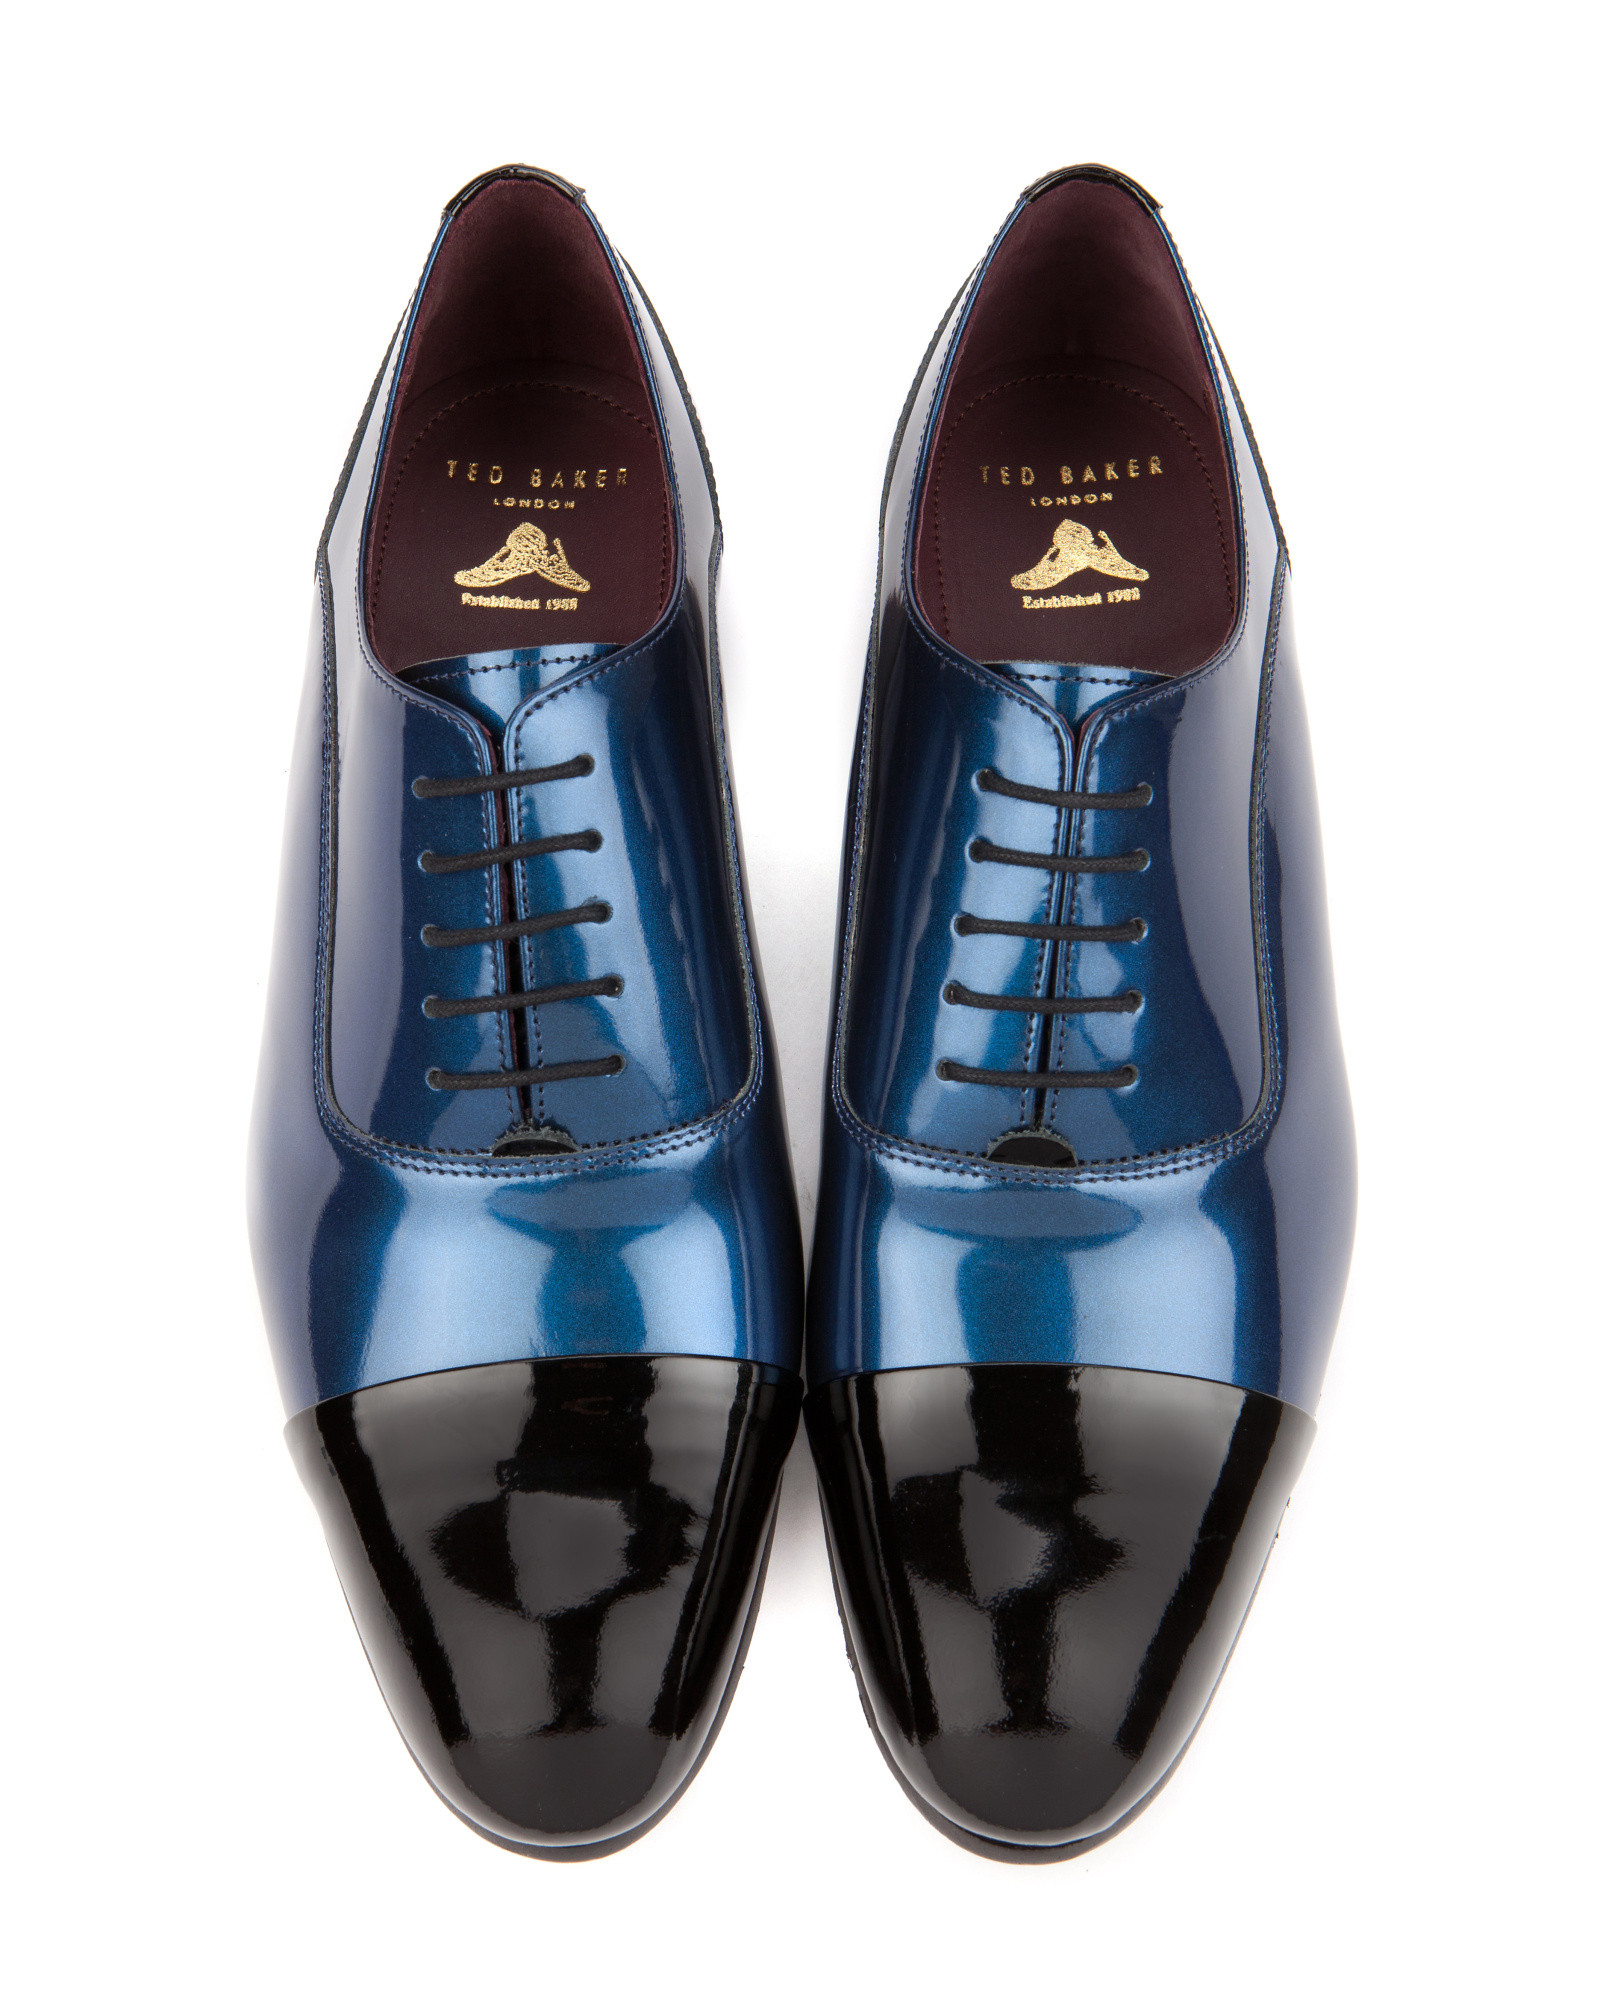 9e6cdf33eaf4 Ted Baker Patent Toe Cap Oxford Shoe in Blue for Men - Lyst